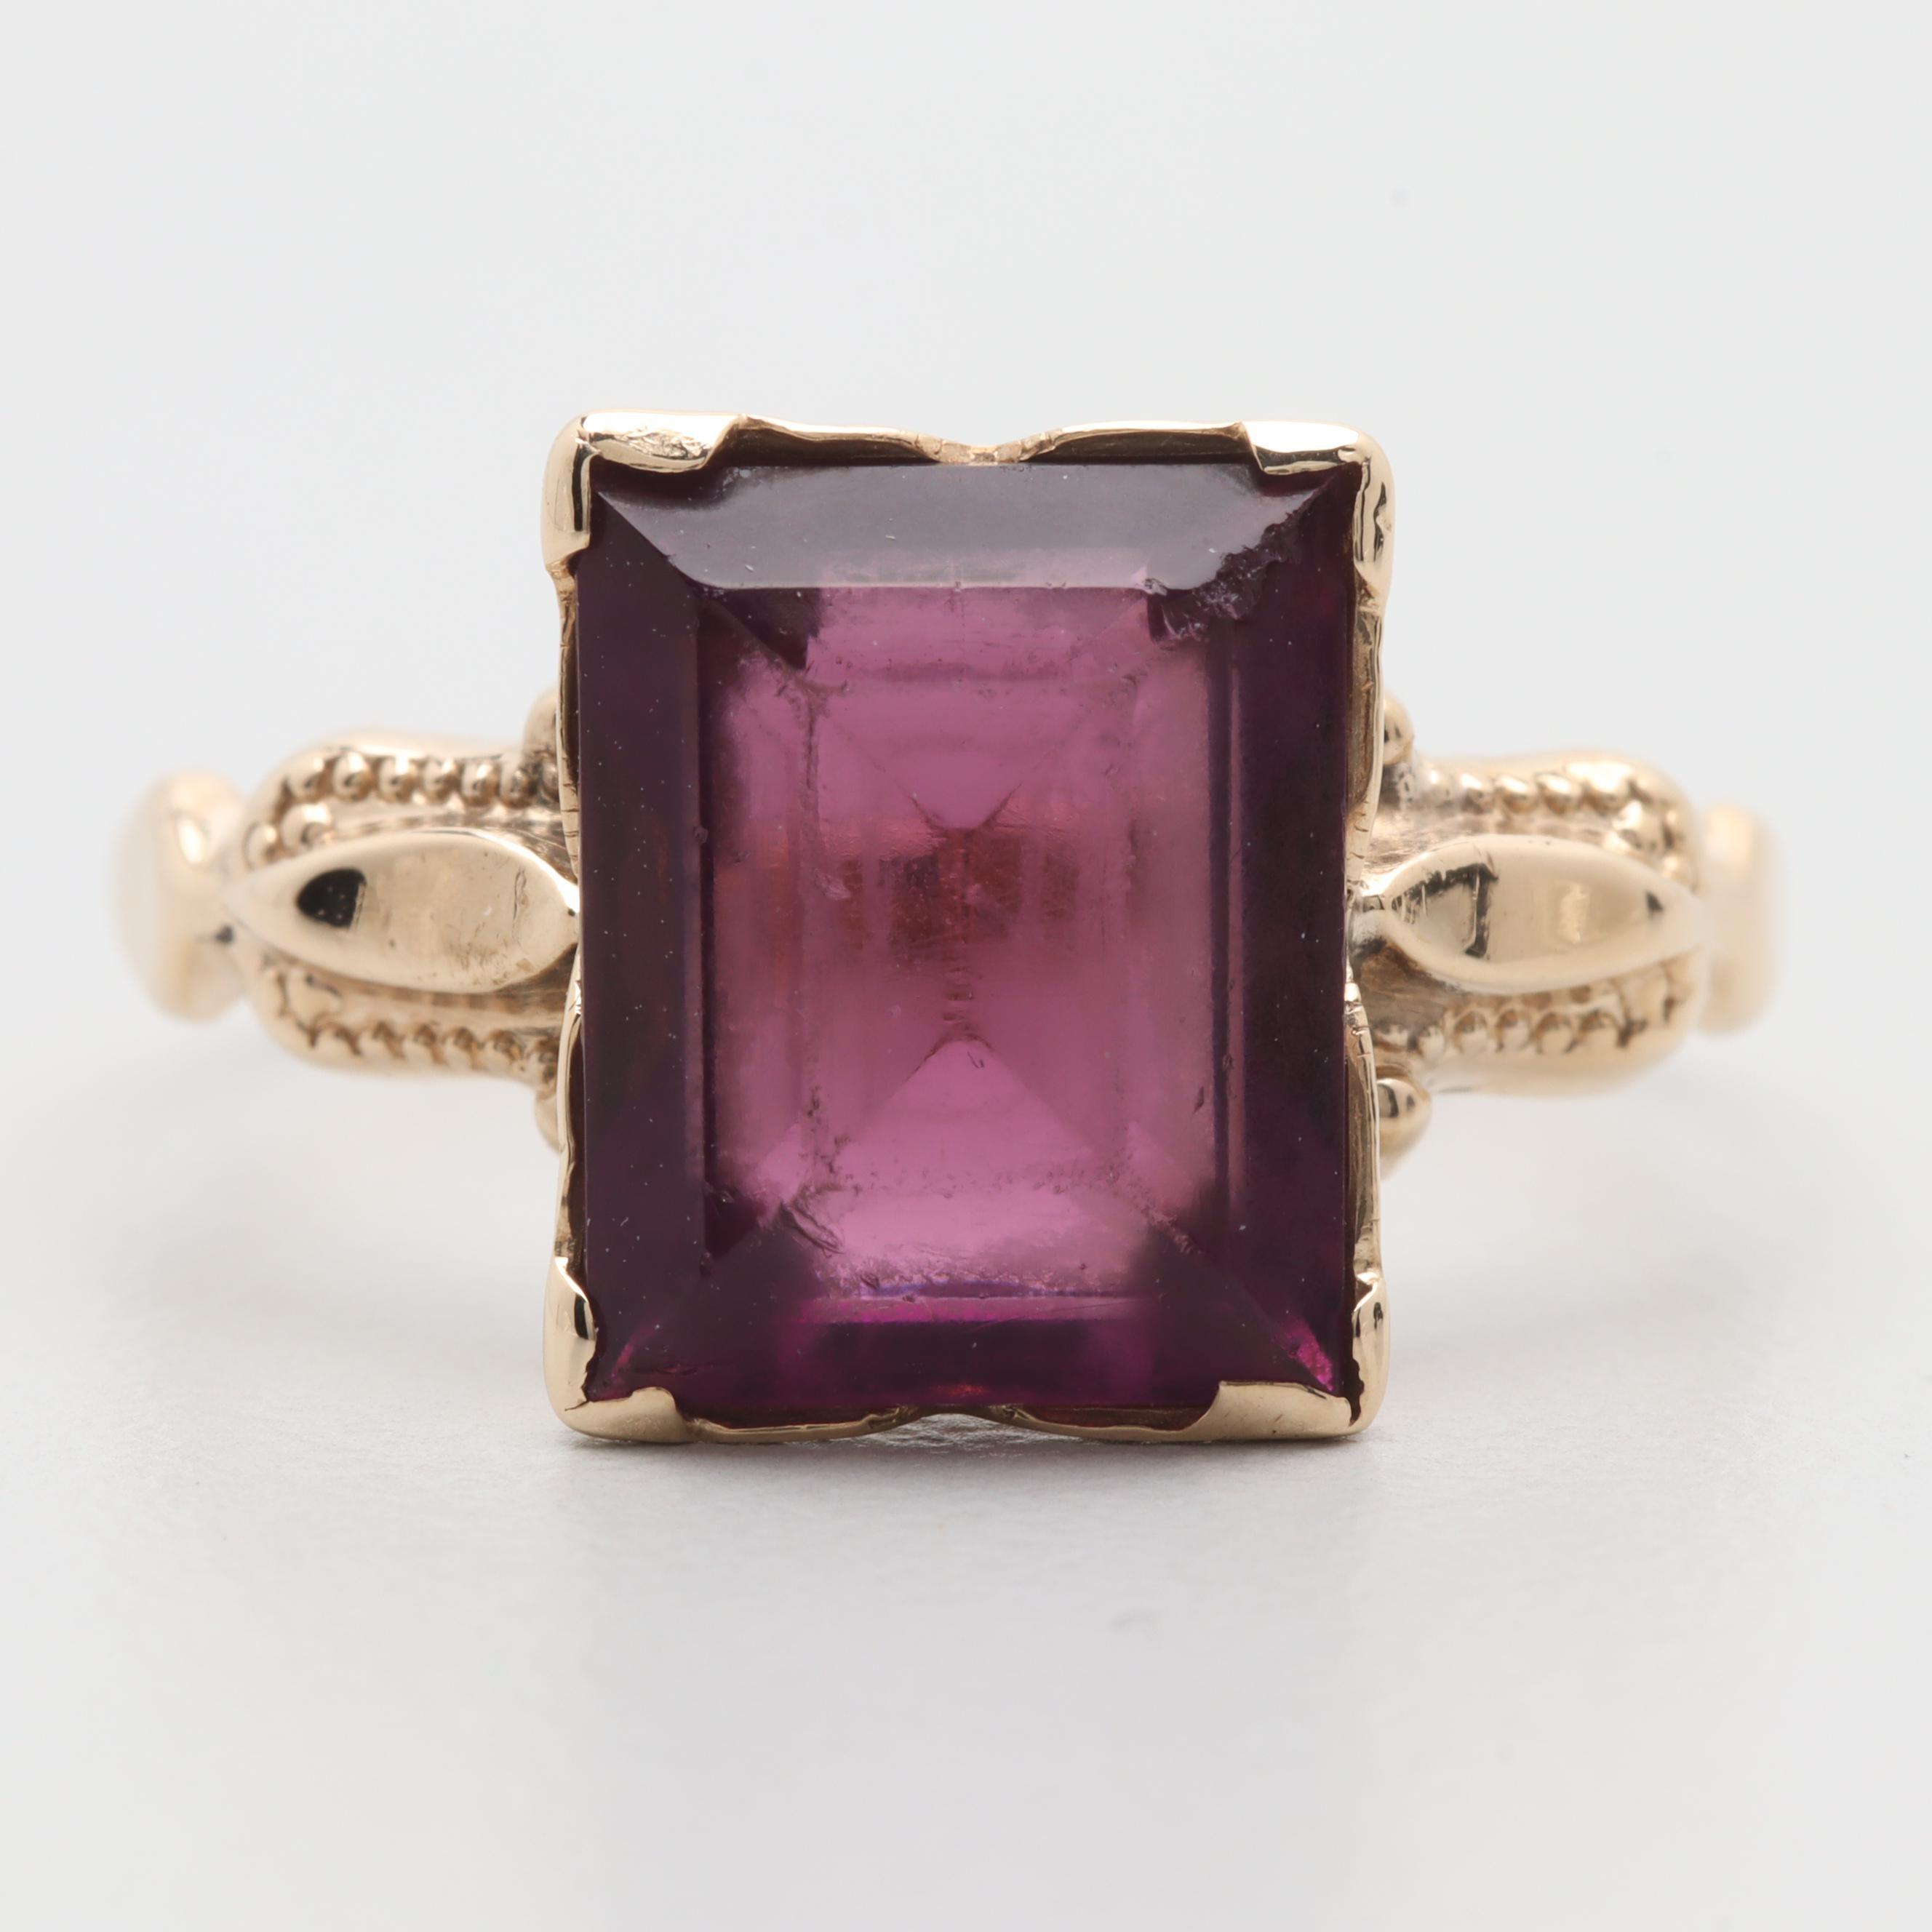 Vintage 10K Yellow Gold Purple Glass Ring